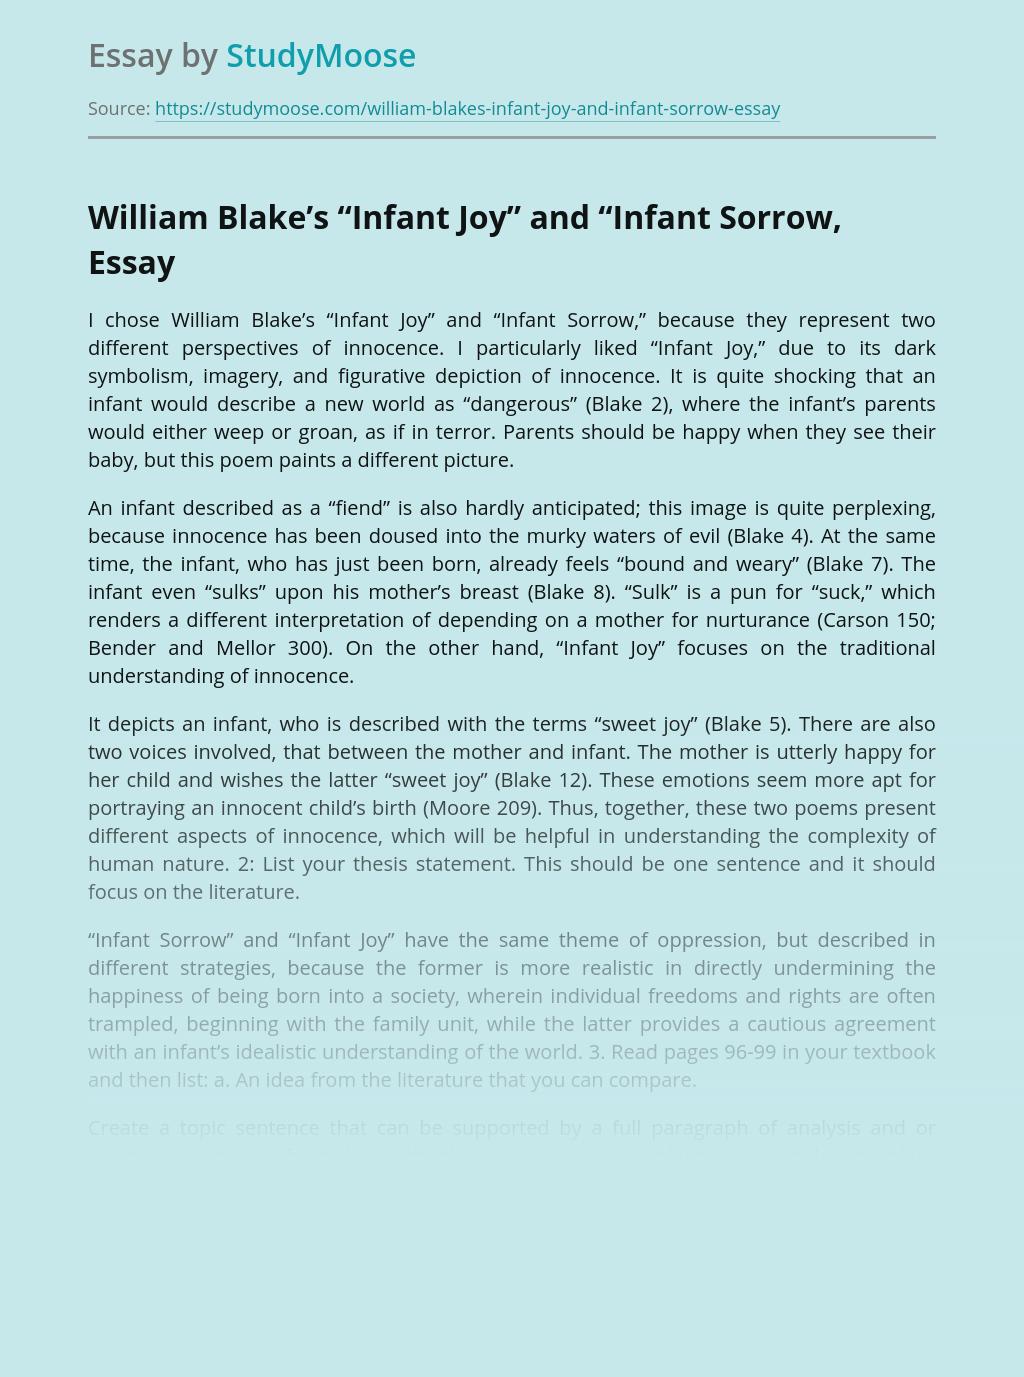 Analysis of Infant Joy and Infant Sorrow Poems